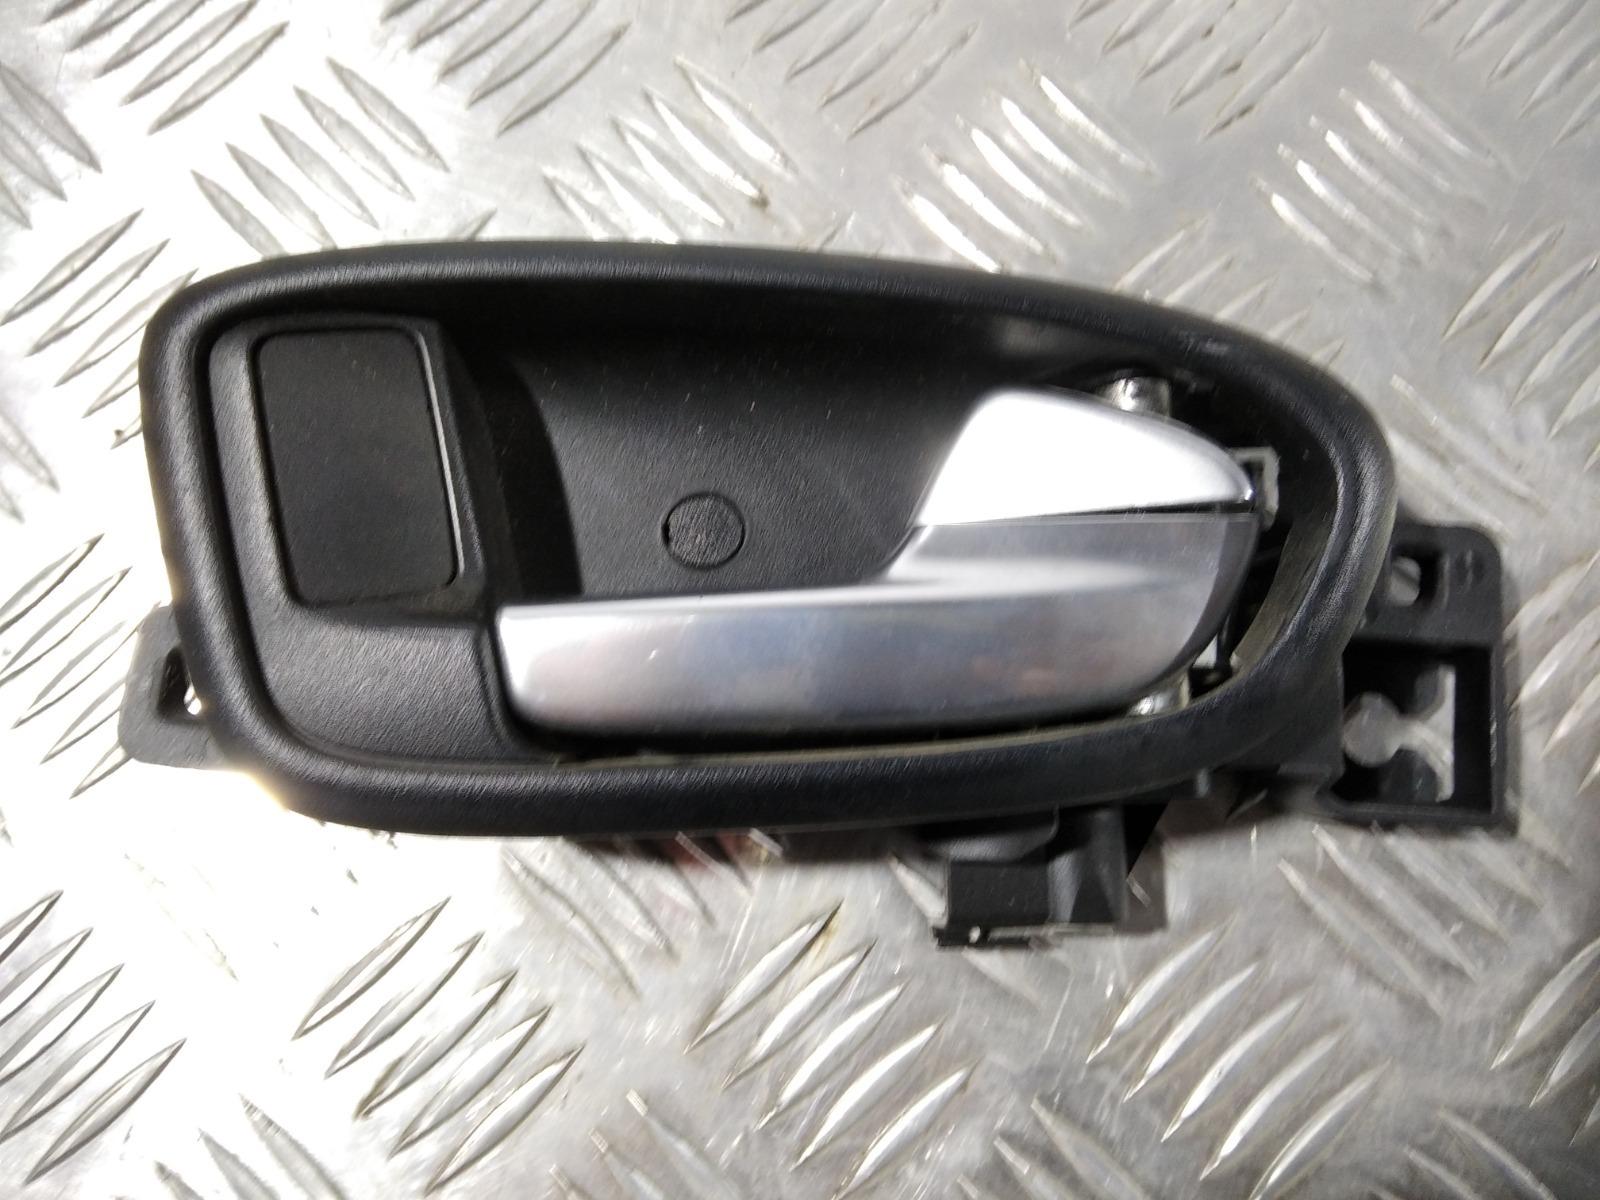 Ручка внутренняя задняя правая Ford Mondeo 1.8 2009 (б/у)